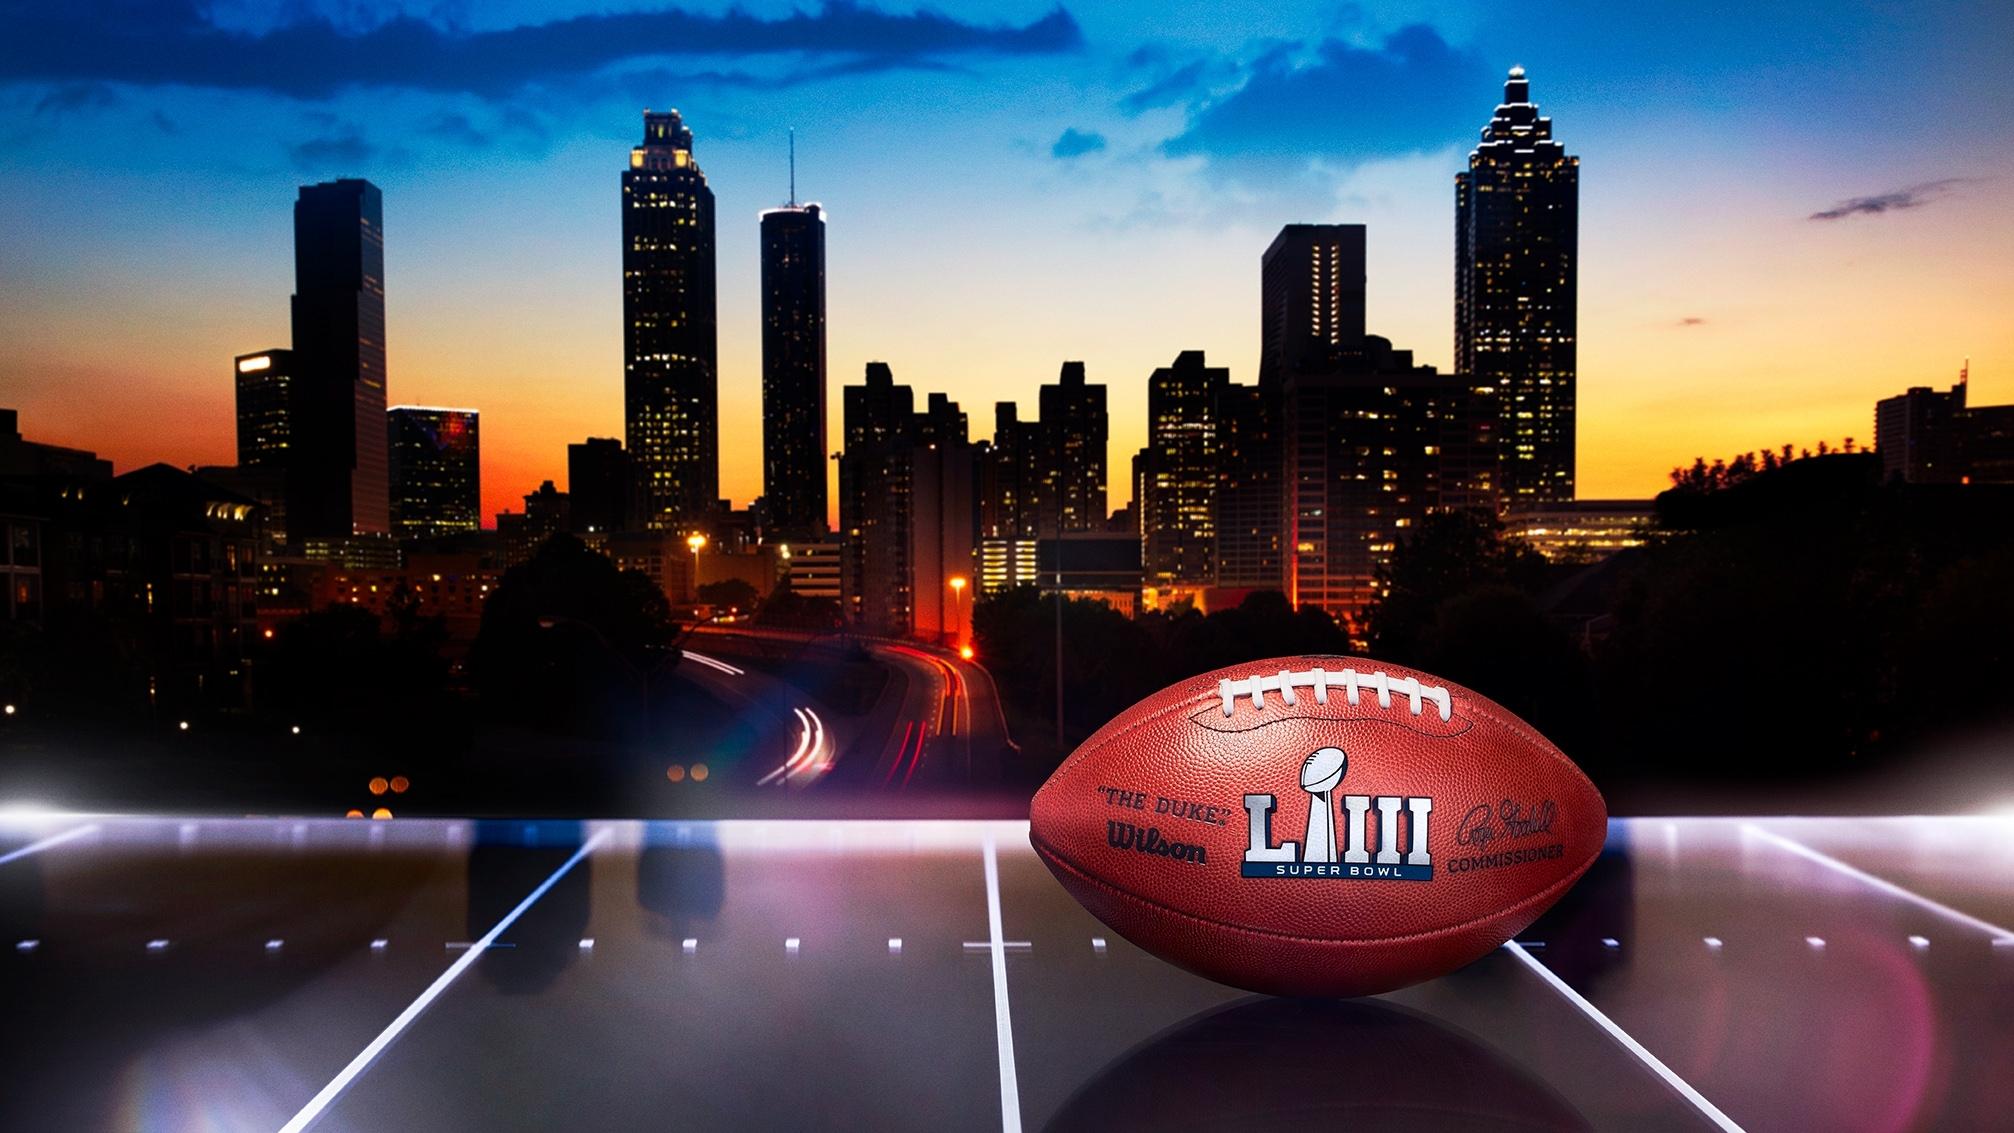 Superbowlliii: Showtime Saturday Night | The Atlanta Voice with Super Bowl 2019 Showtime